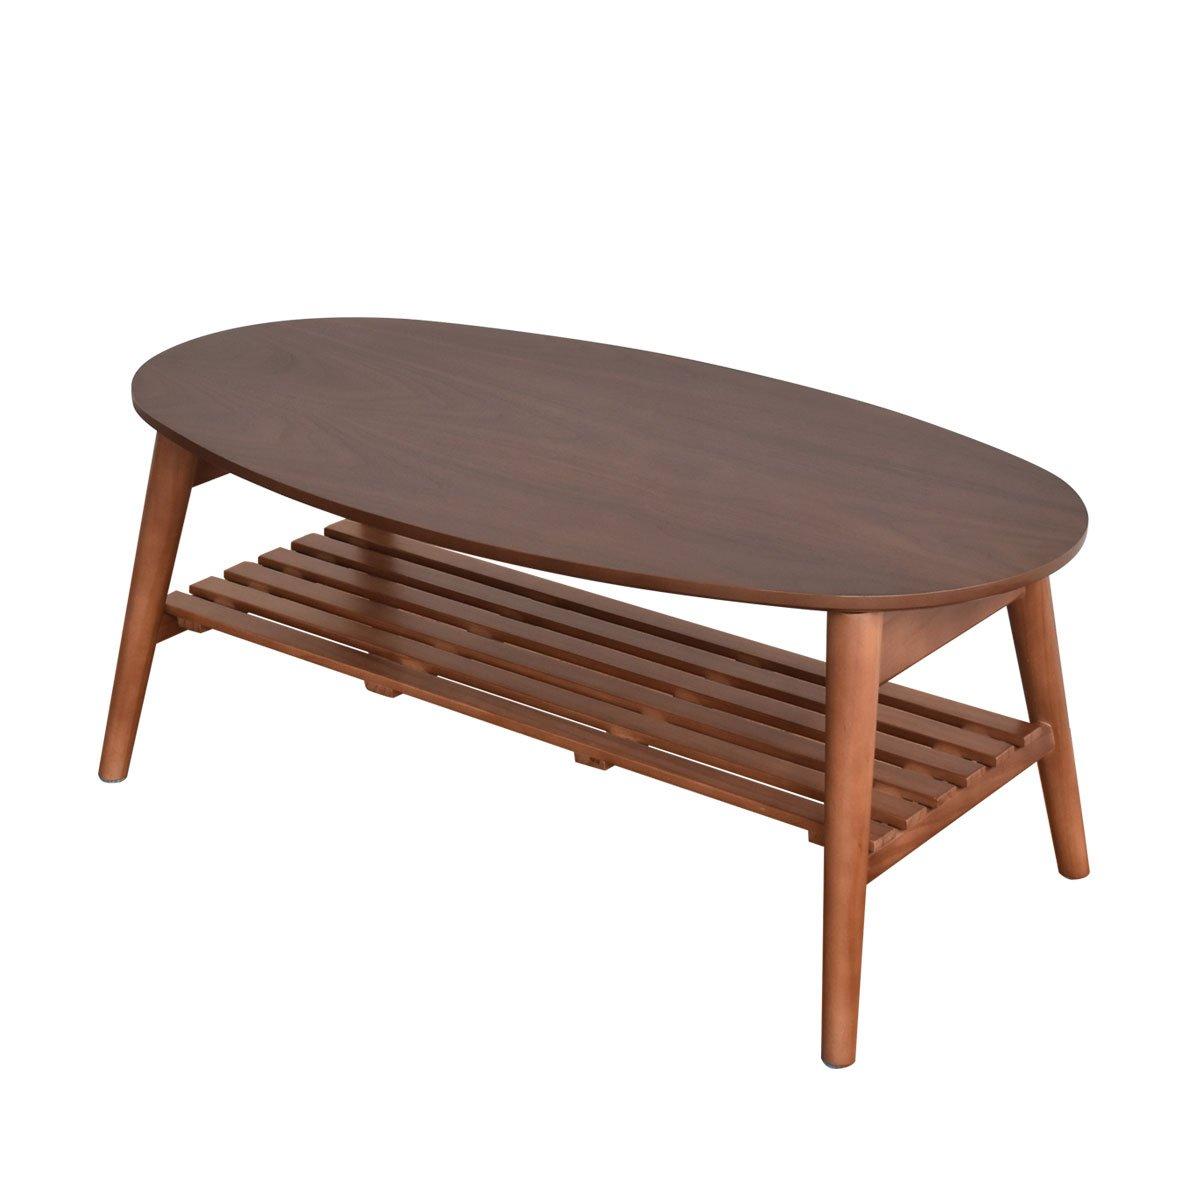 VANETTE(バネット) ウォールナット 折りたたみテーブル 幅88cm (オーバル型) B07D8RZSXD